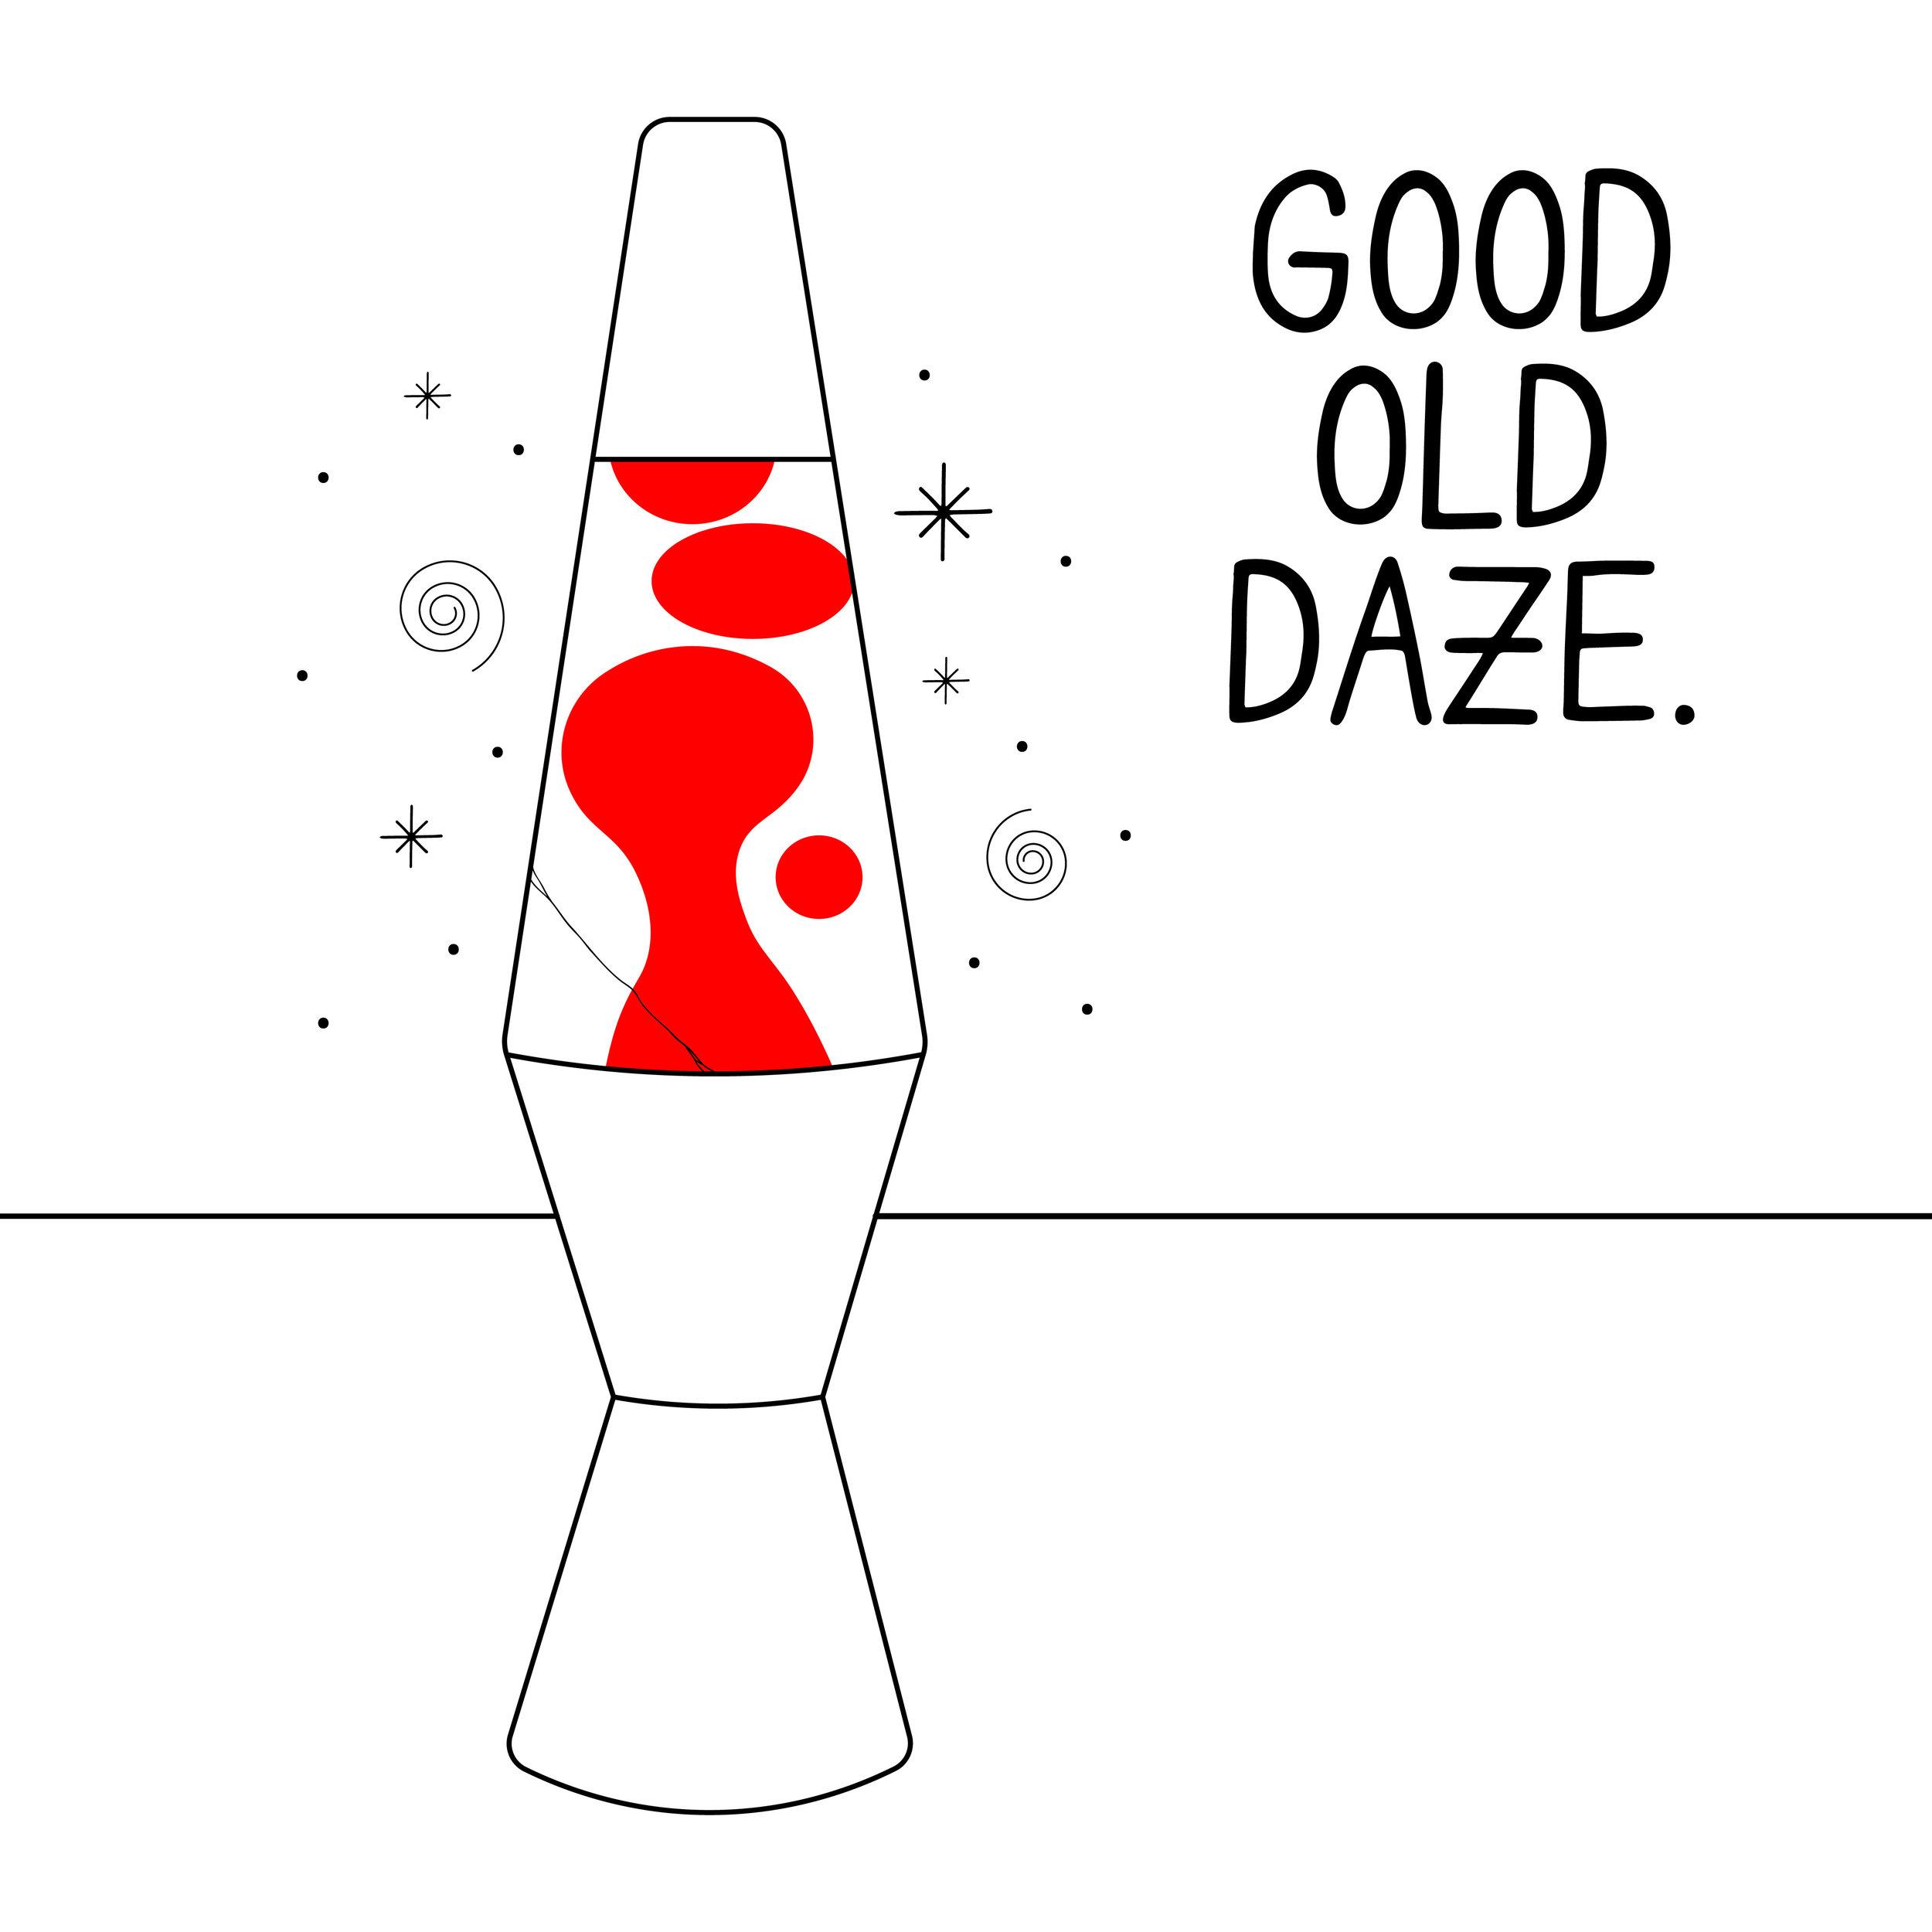 goodolddaze-01.jpg